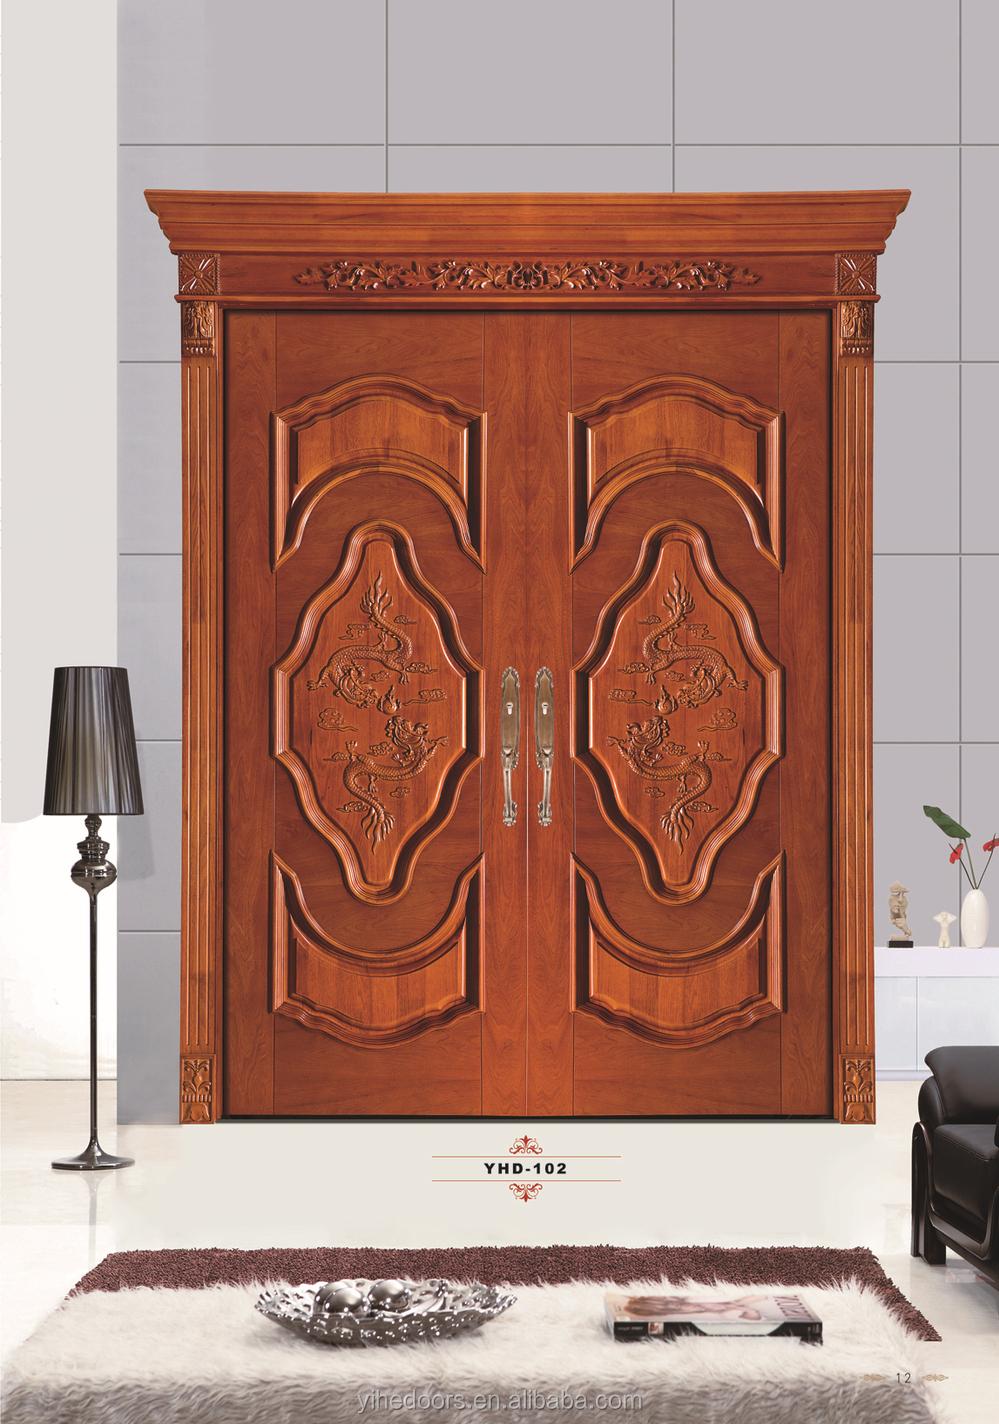 Holz Mode Sicherheits Dekorative Innentür Rahmen - Buy Product on ...